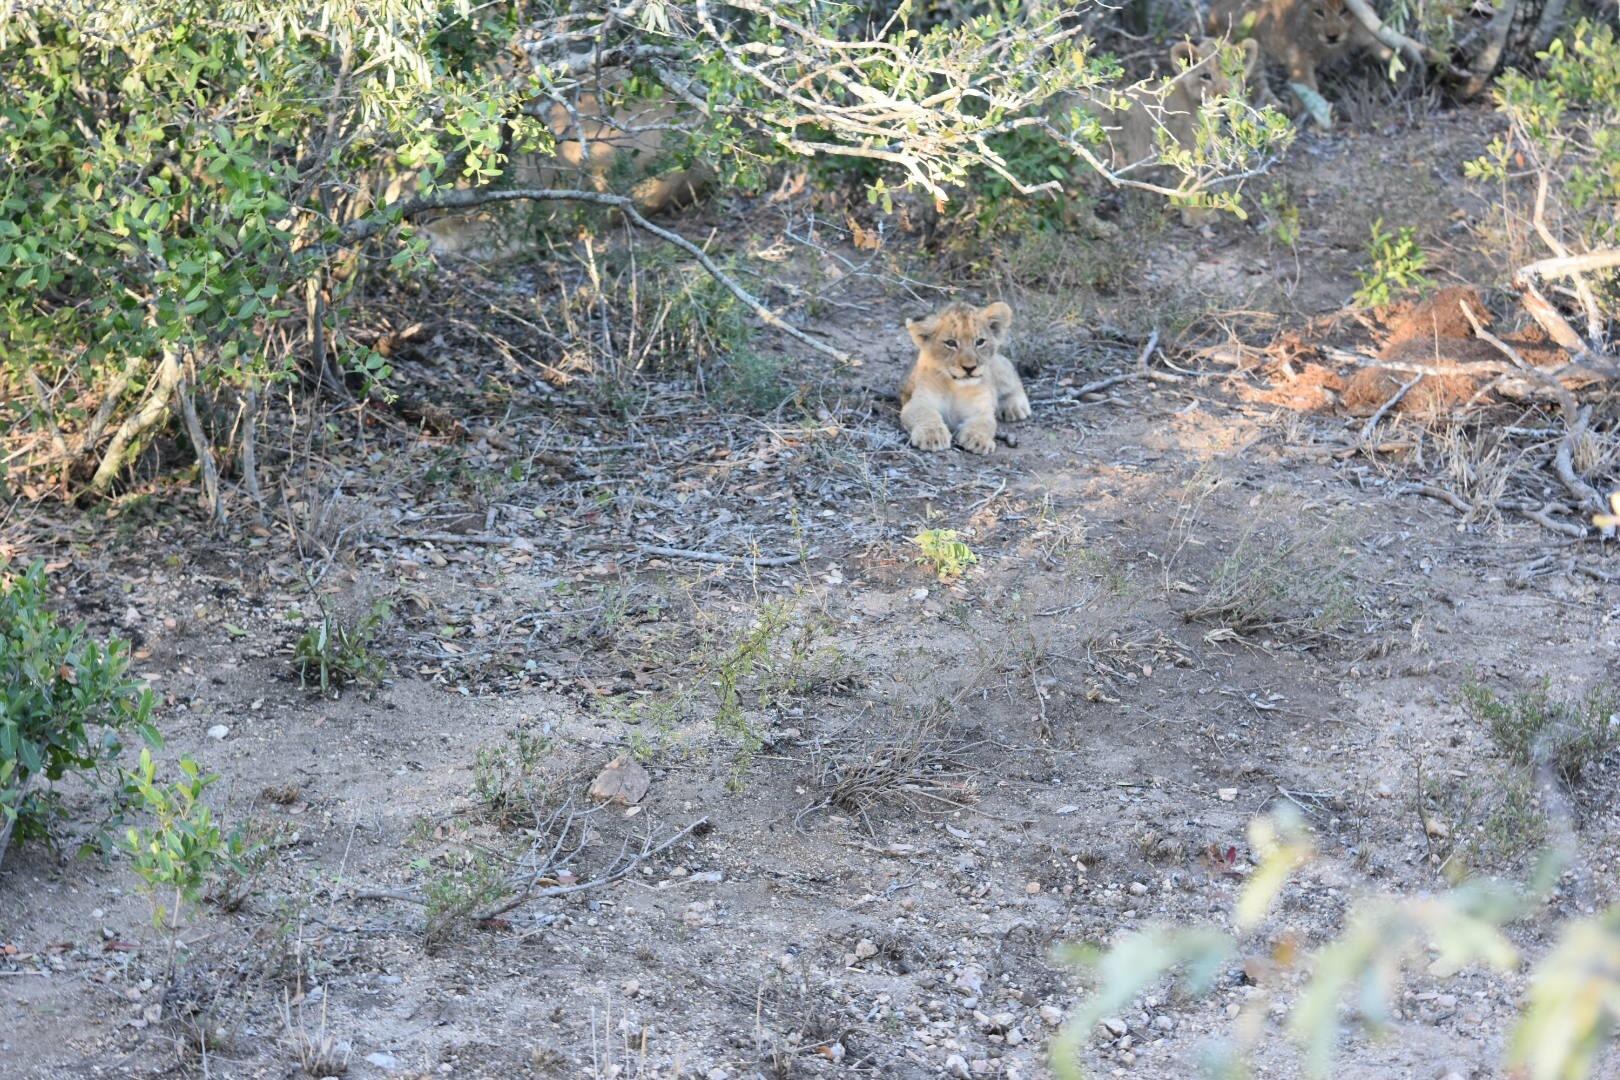 Lion Cub by Patrick Rulo